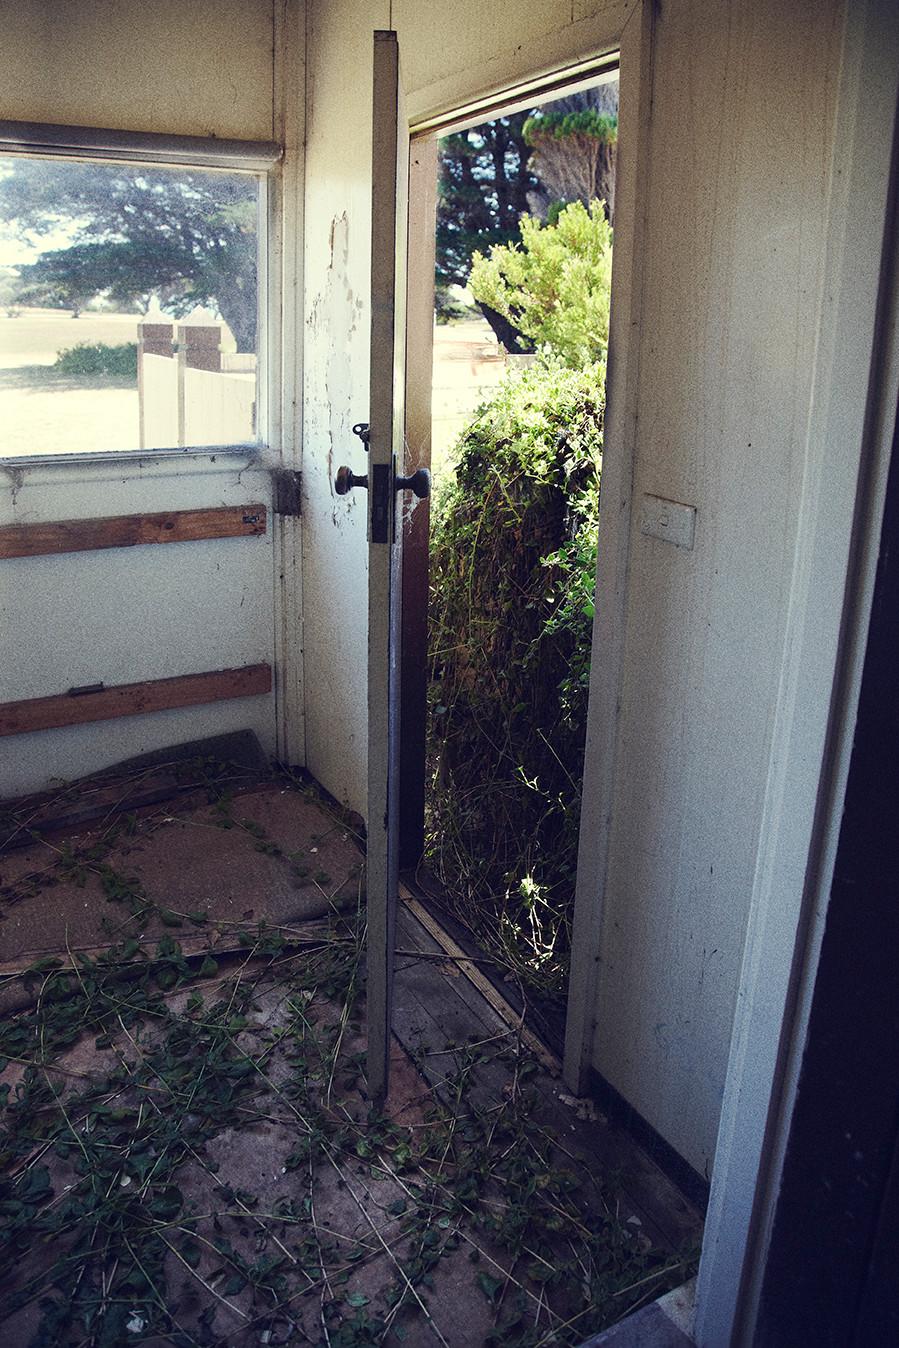 plants invading abandoned quarantine station